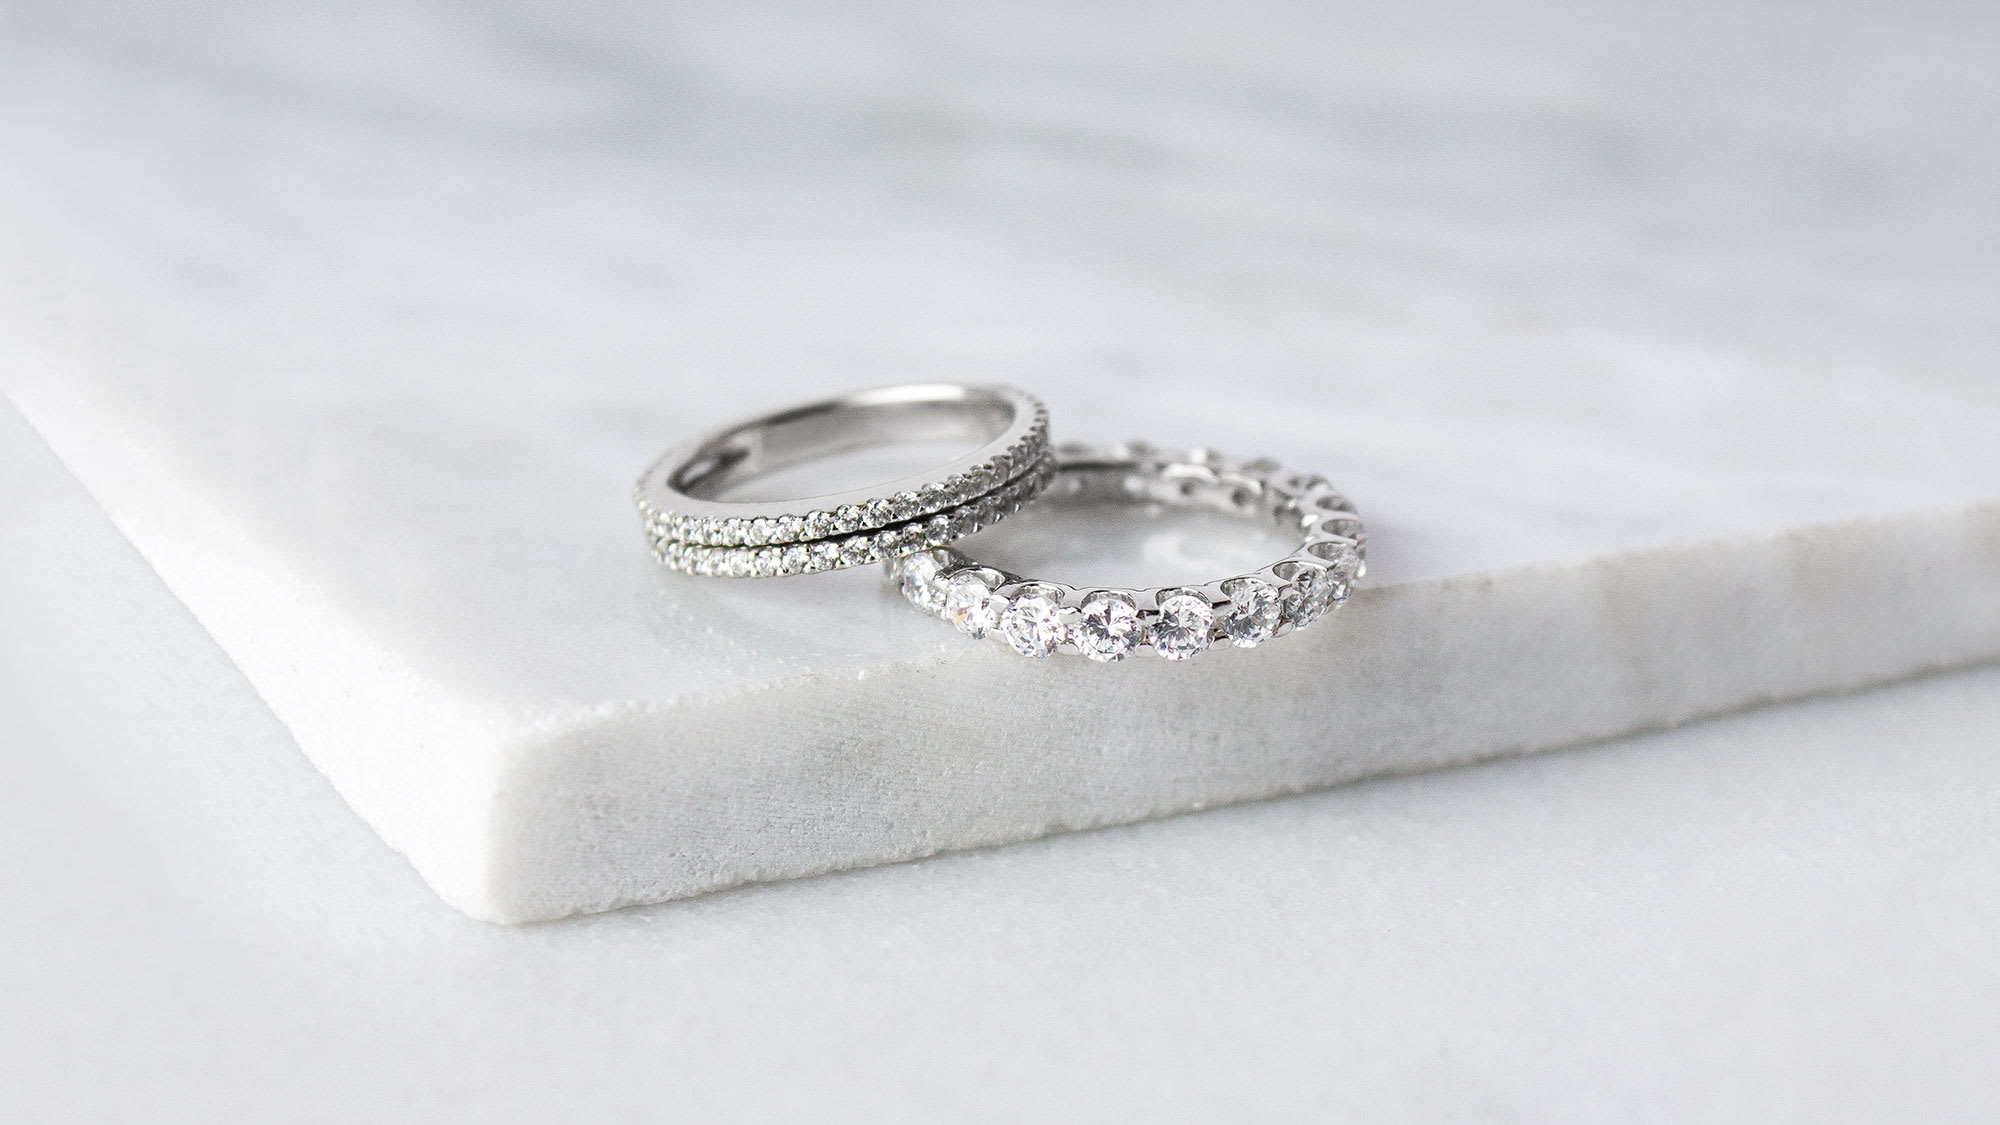 White gold Diamond Nexus wedding bands stacked together.